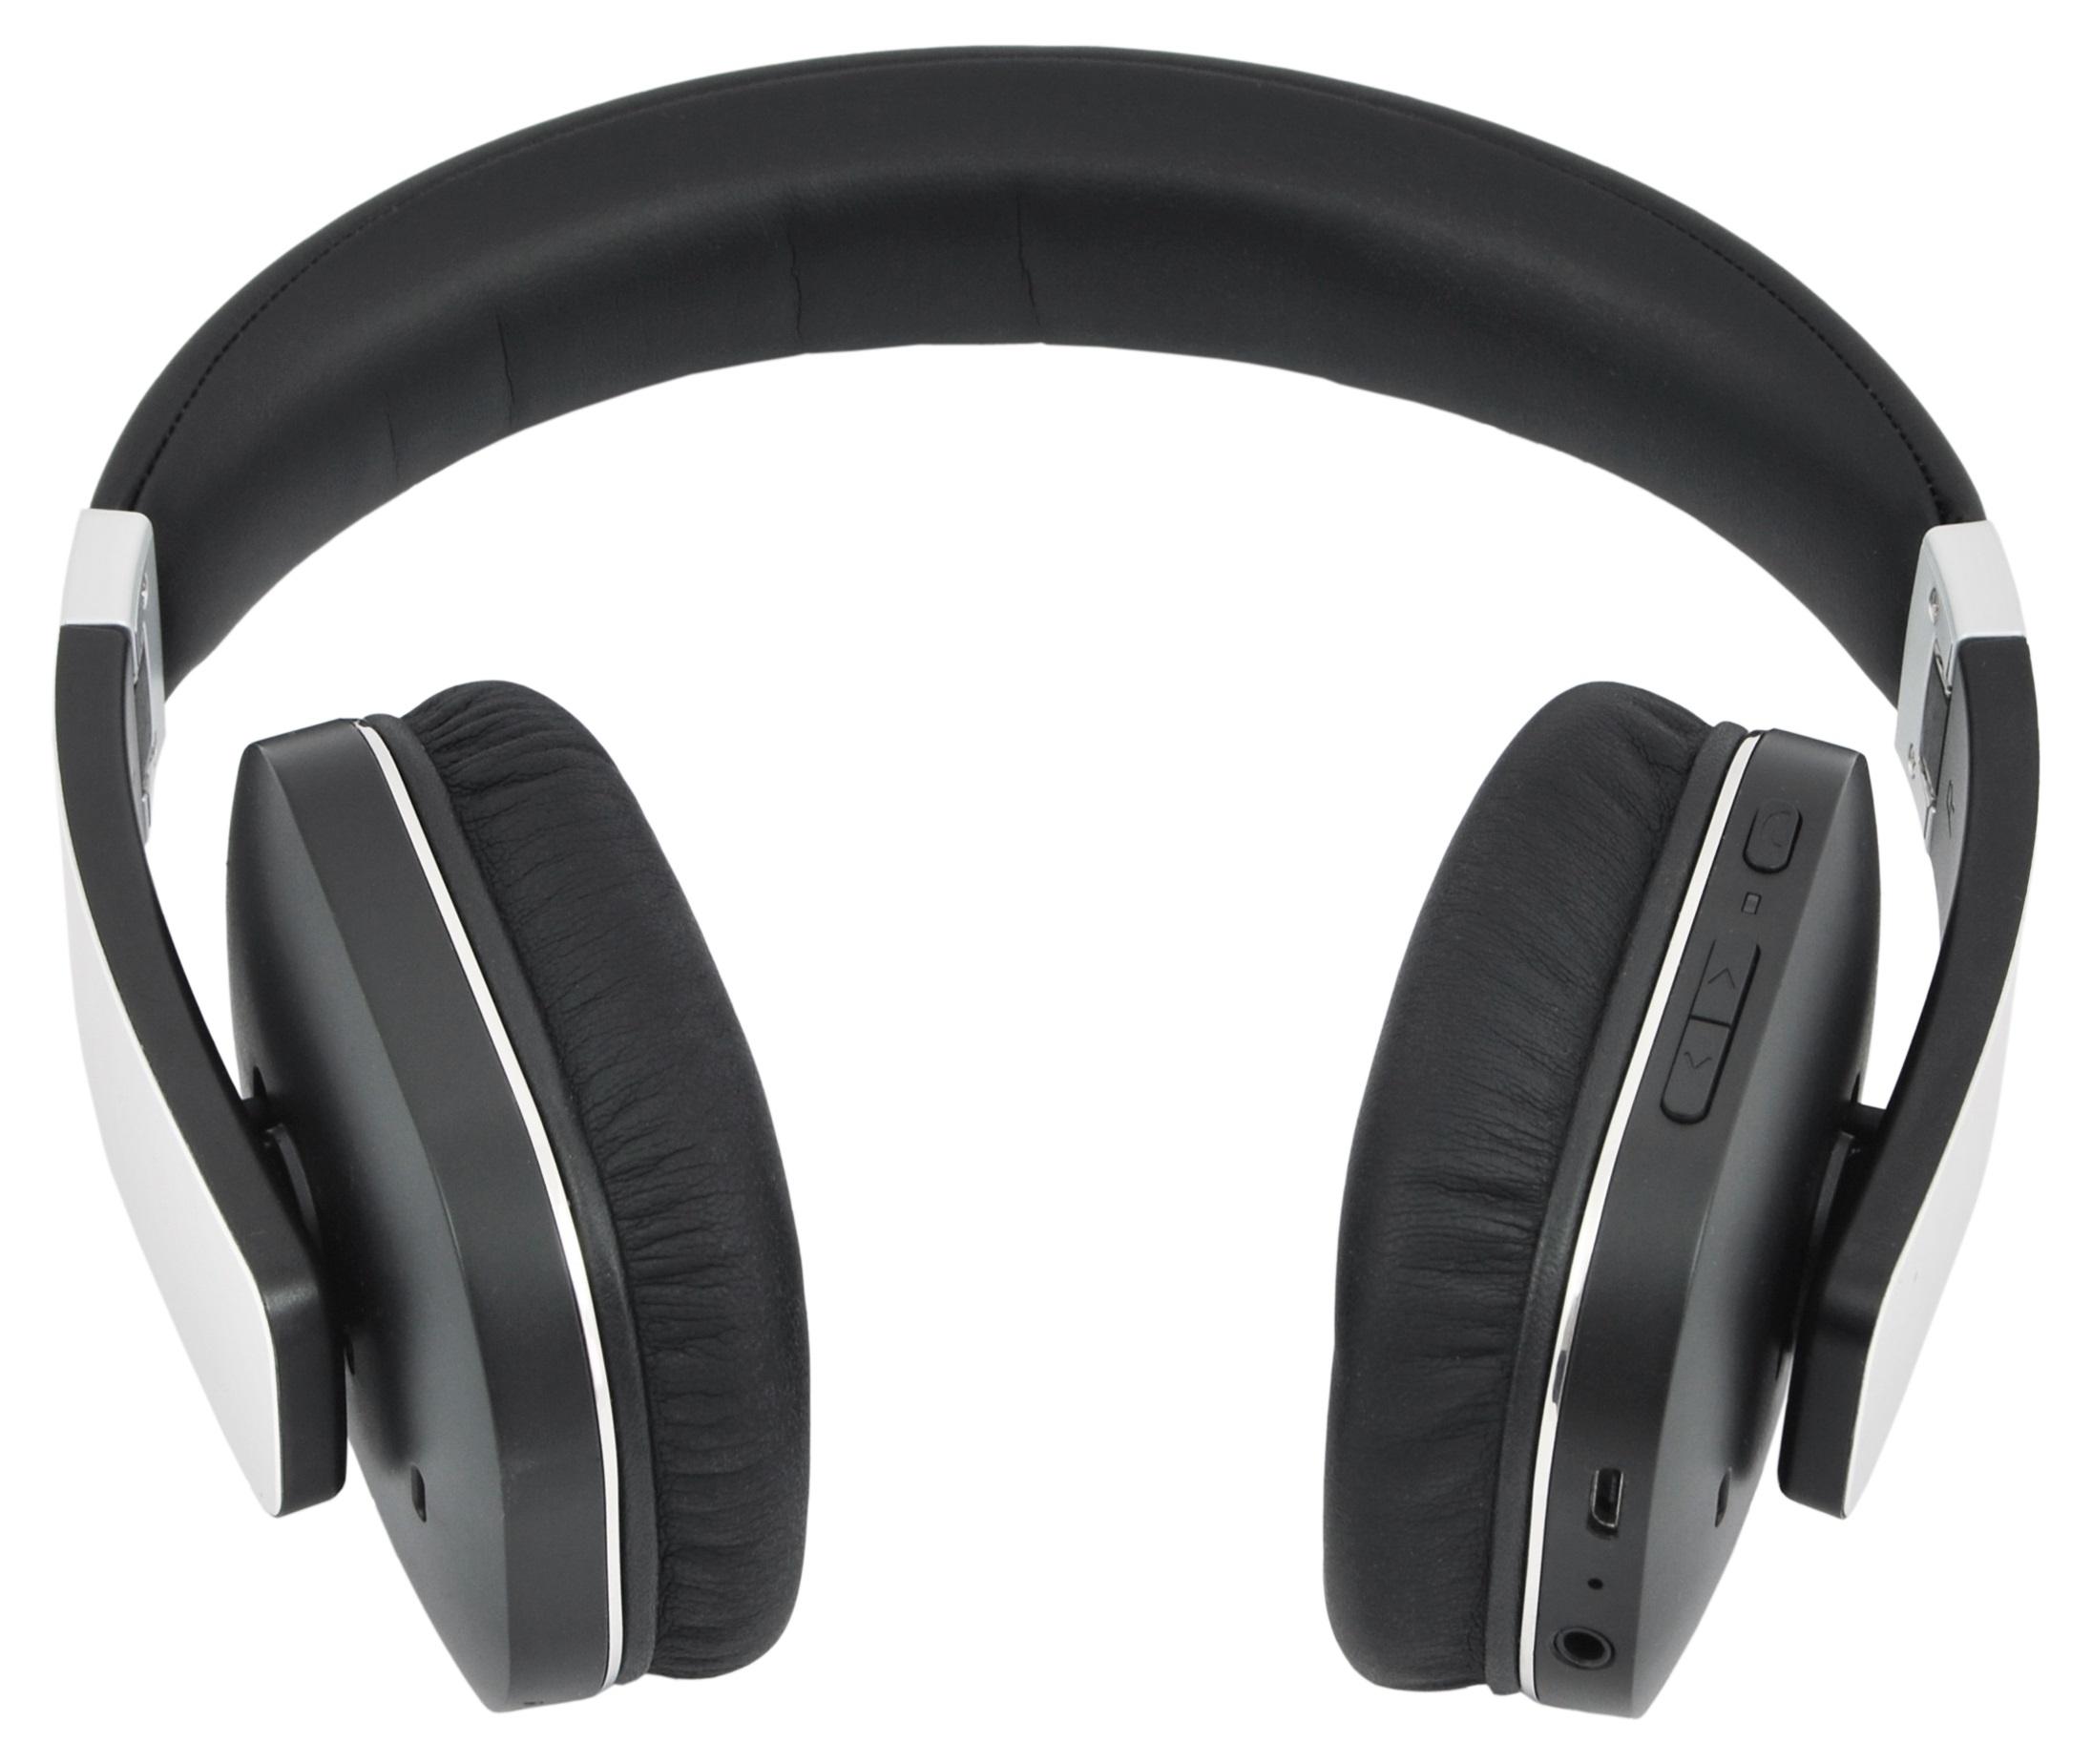 CEL-TEC  F5A-Active noisa-Bluetooth Stereo sluchátka s mikrofonem